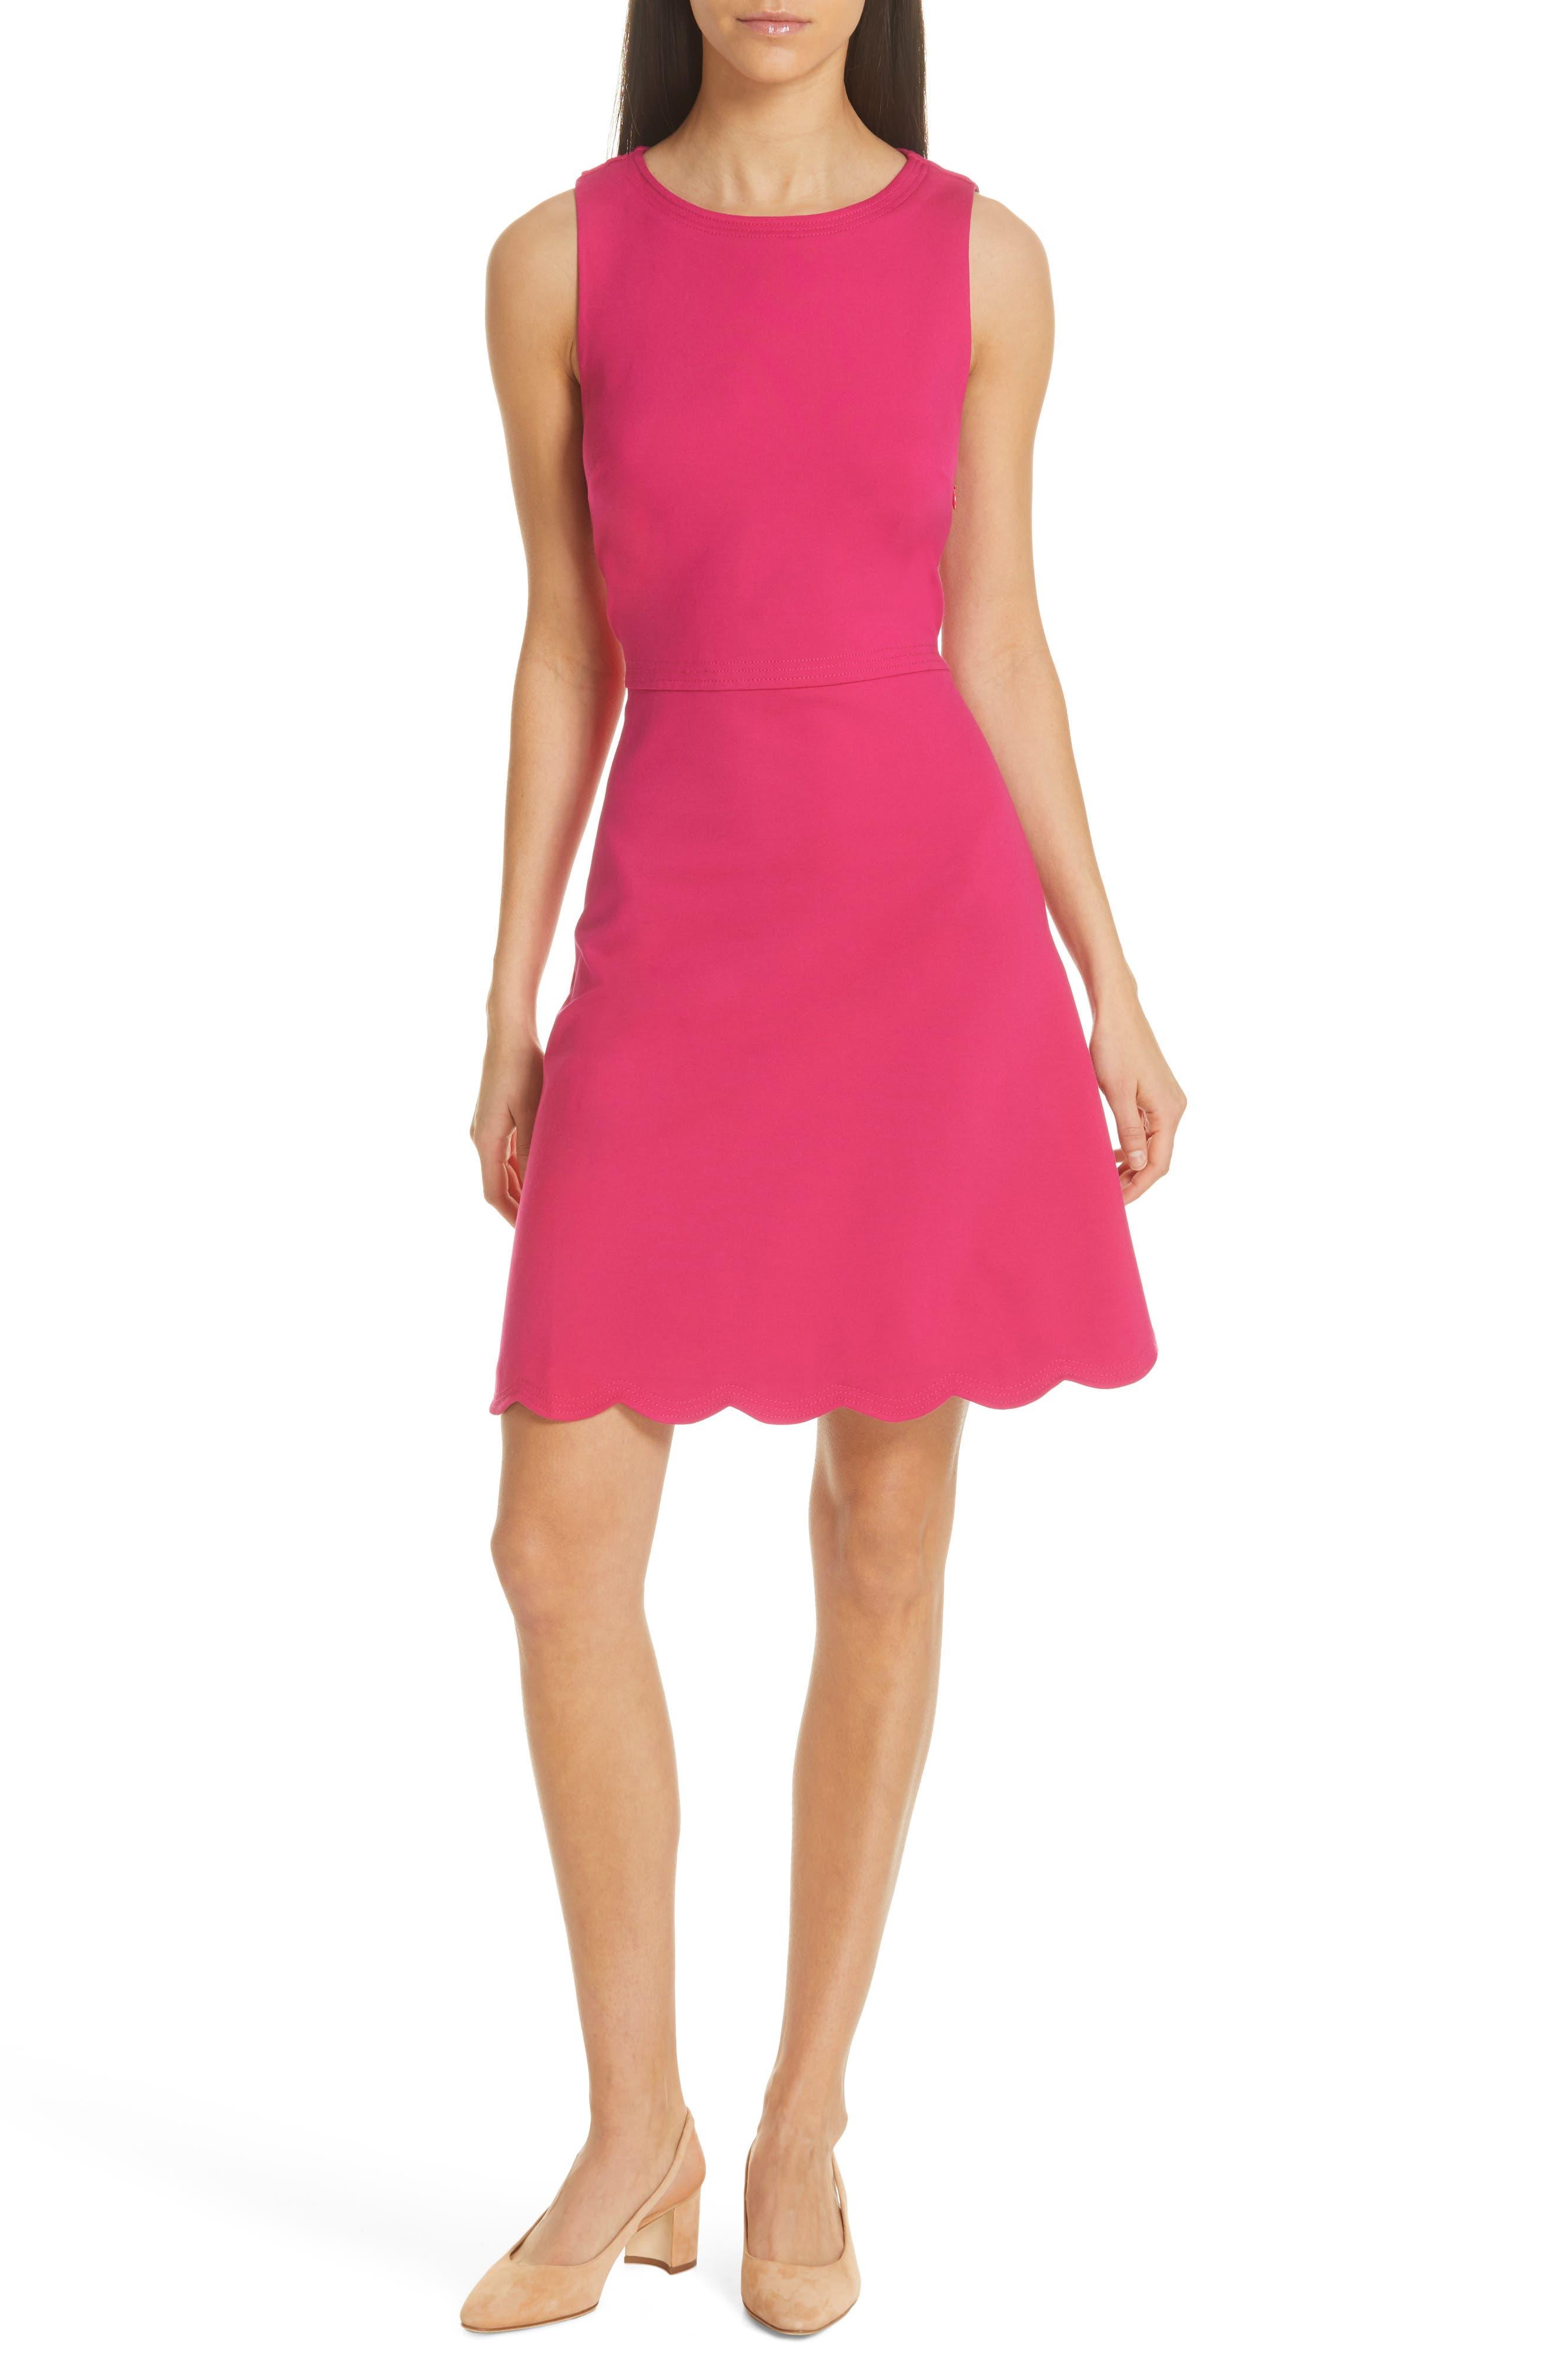 Kate Spade New York Scalloped Ponte Dress, Pink